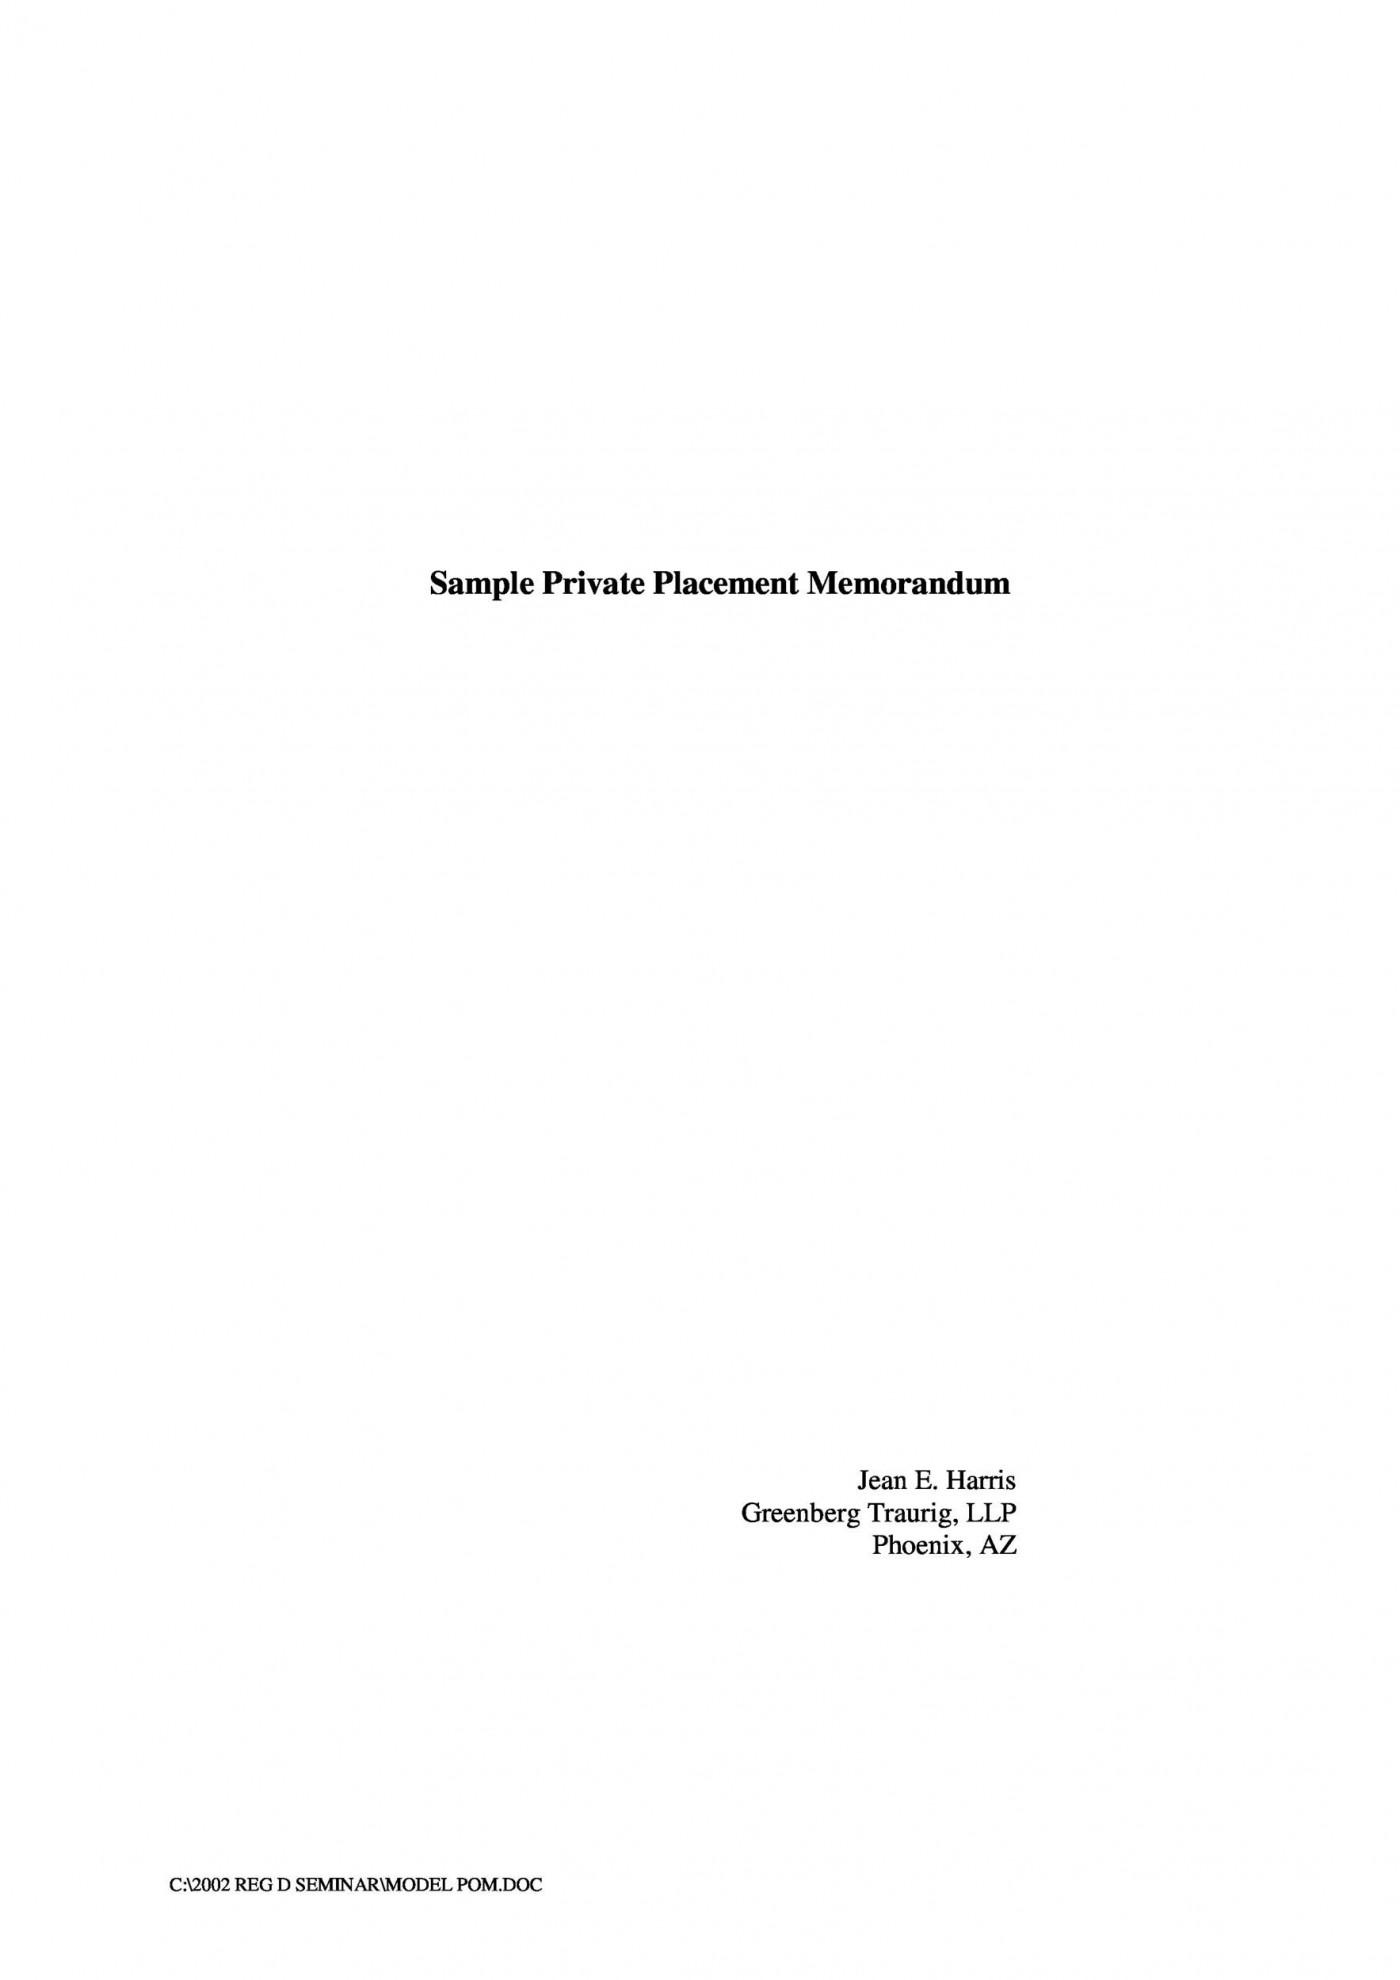 002 Magnificent Free Private Placement Memorandum Template Concept 1400